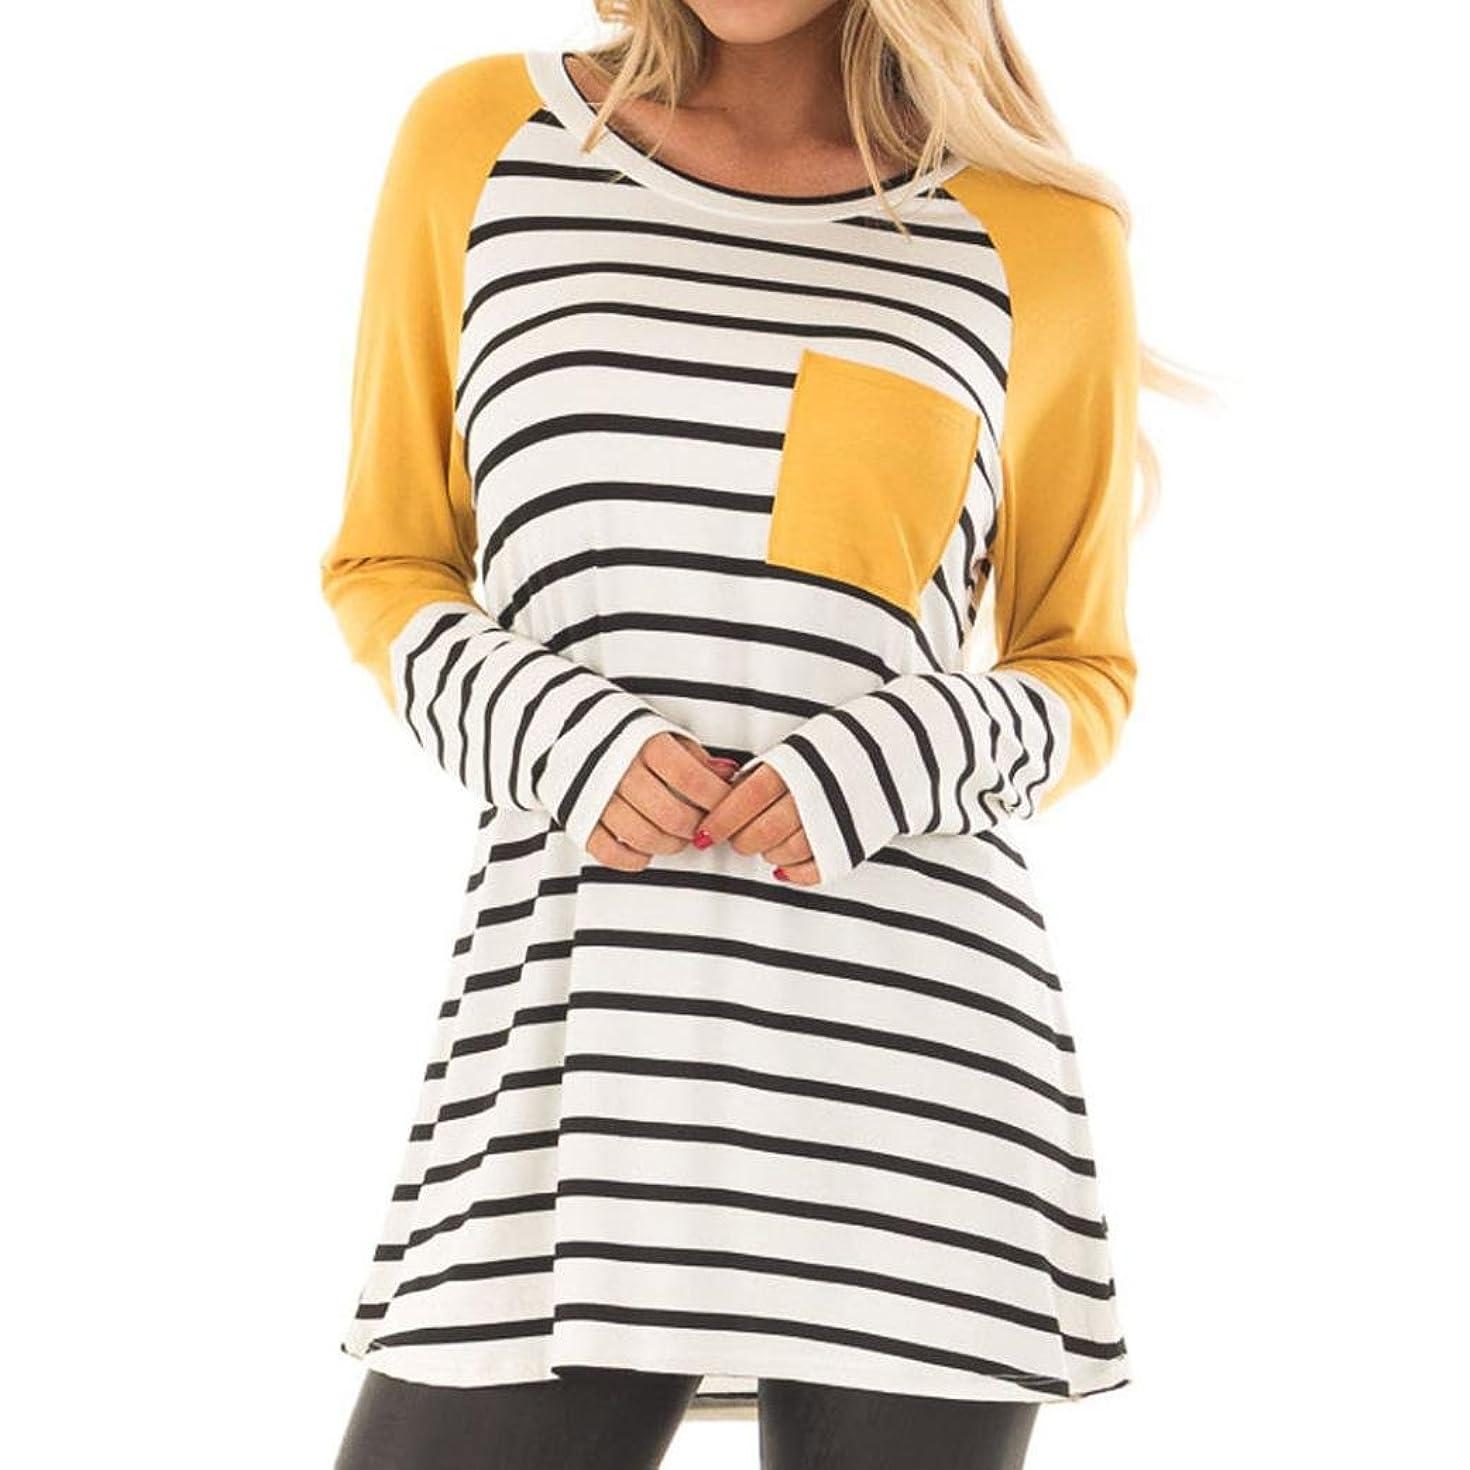 Hemlock Long Women Shirts Long Sleeves Top Spring Stripe Blouse Tees Women Office Shirts (L, Yellow)